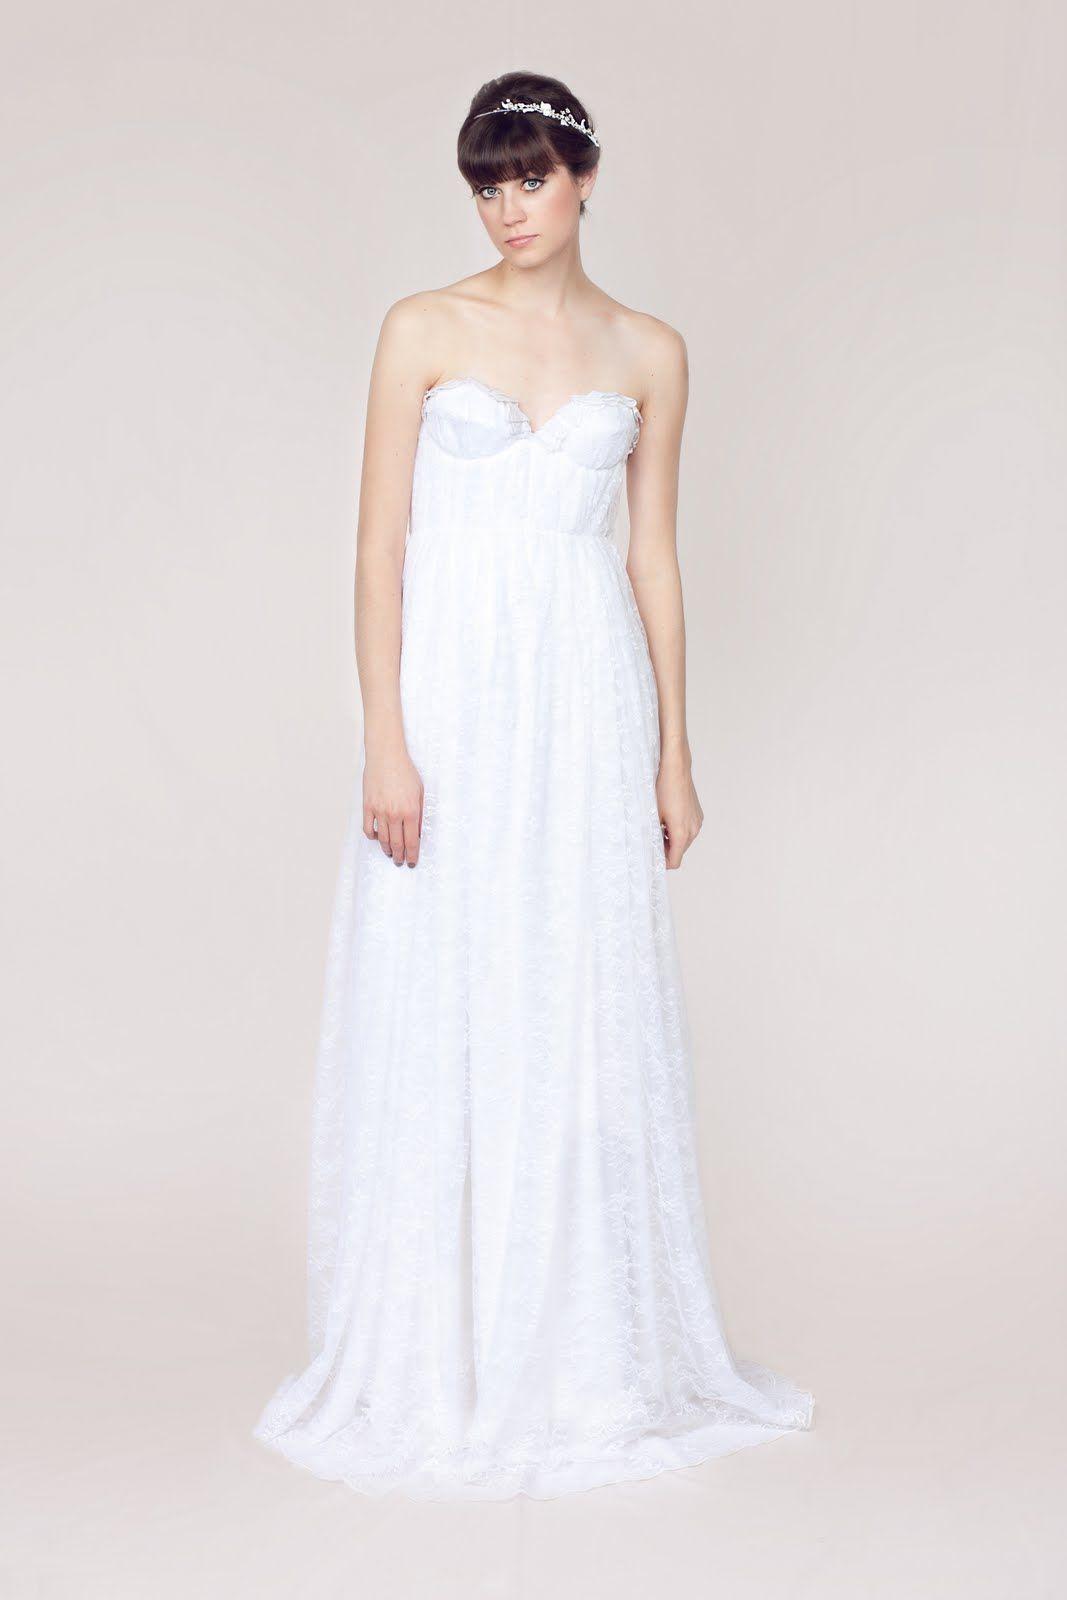 43++ Sarah seven wedding dress information